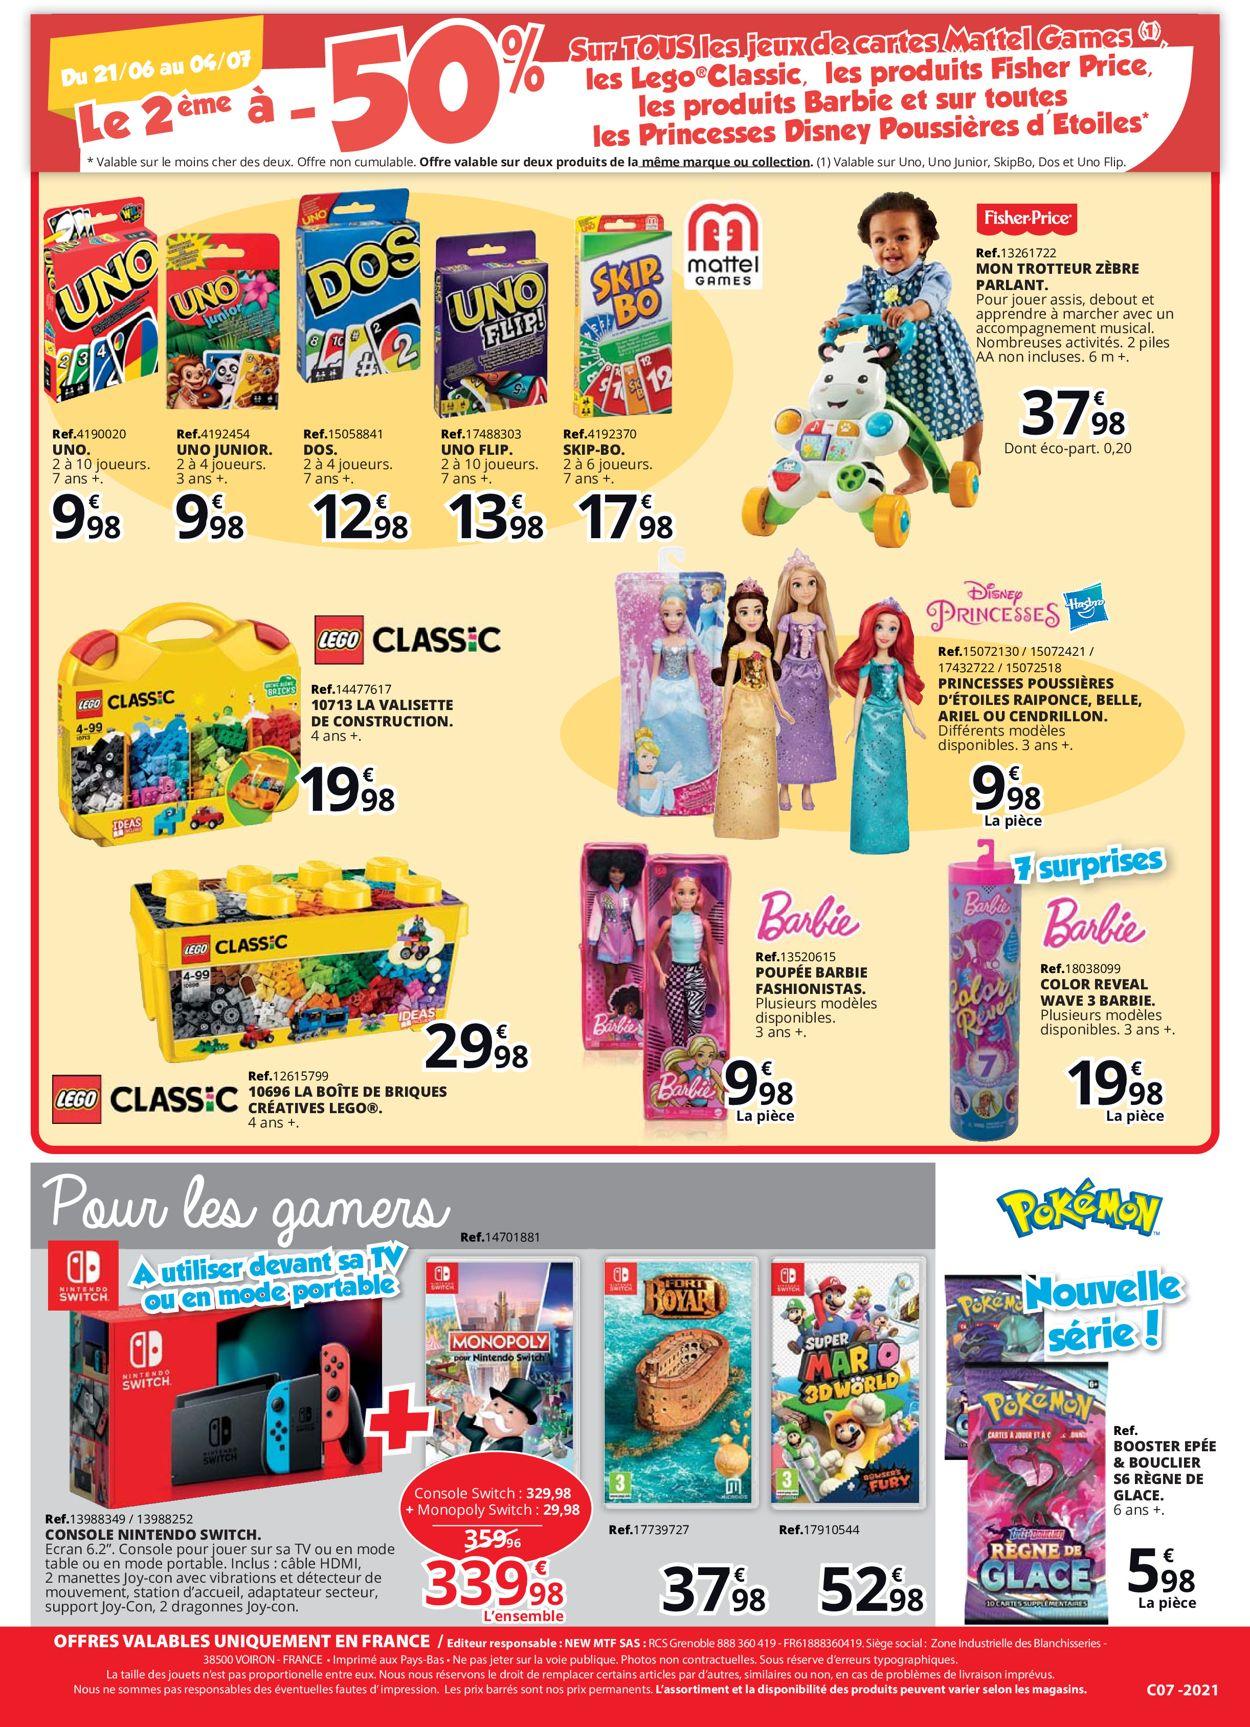 Maxi Toys Catalogue - 21.06-18.07.2021 (Page 8)